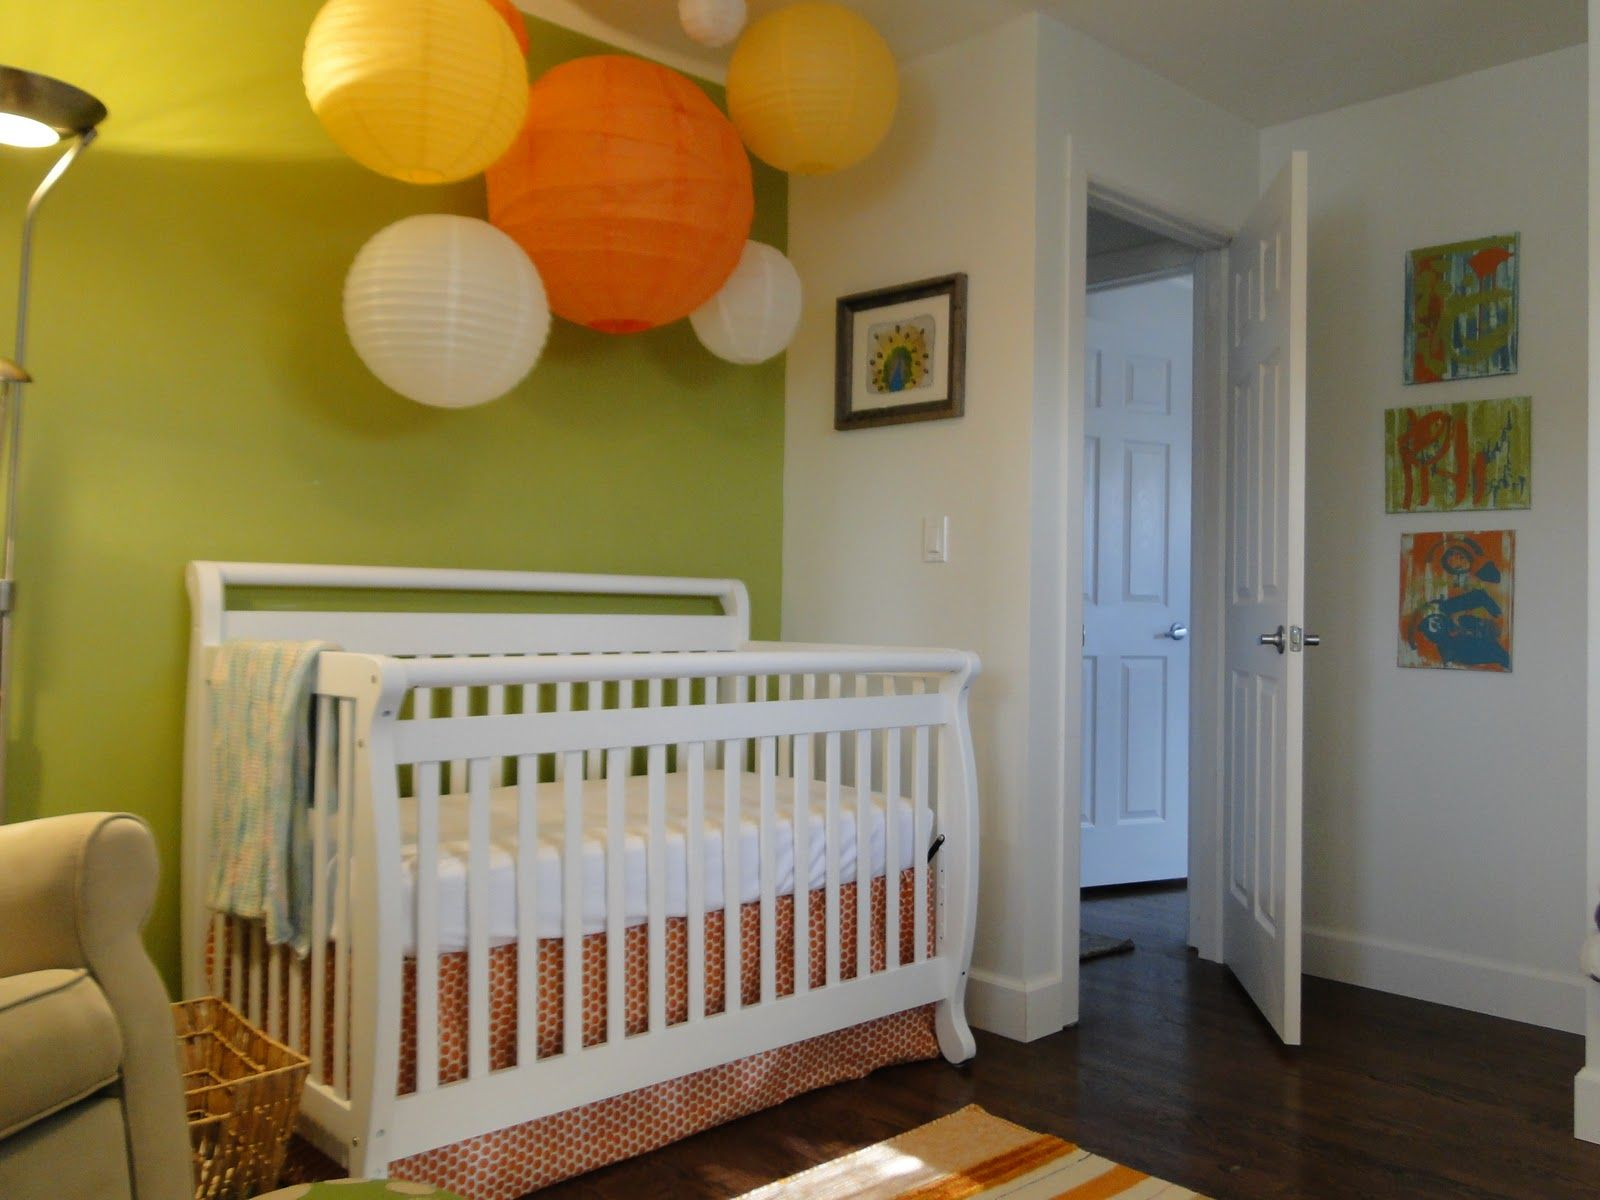 Sherwin Williams Sassy Green Paint Colors Pinterest